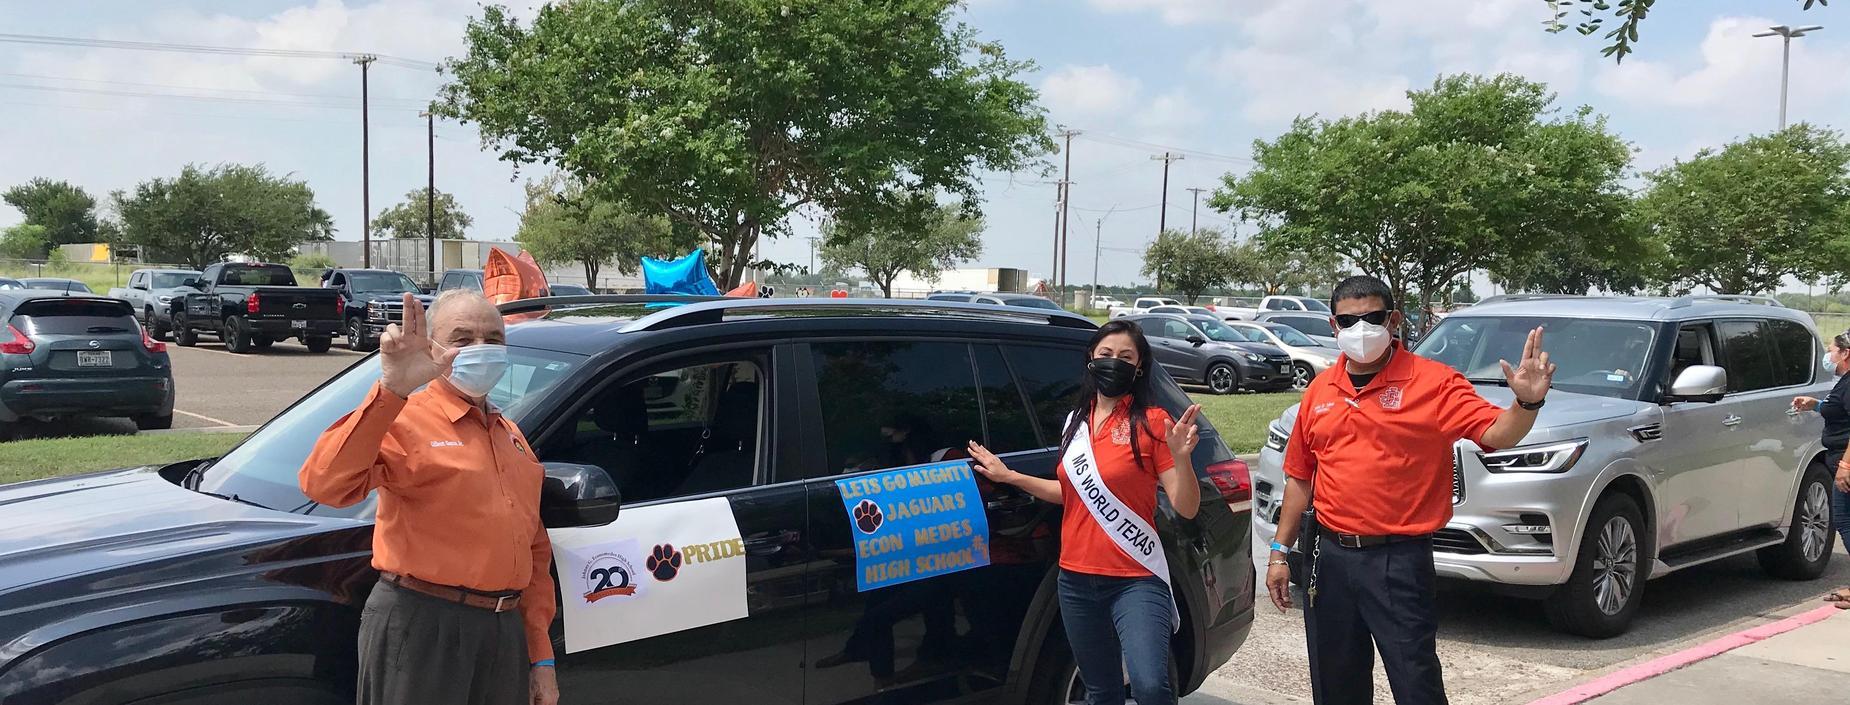 Ms World Texas 2020